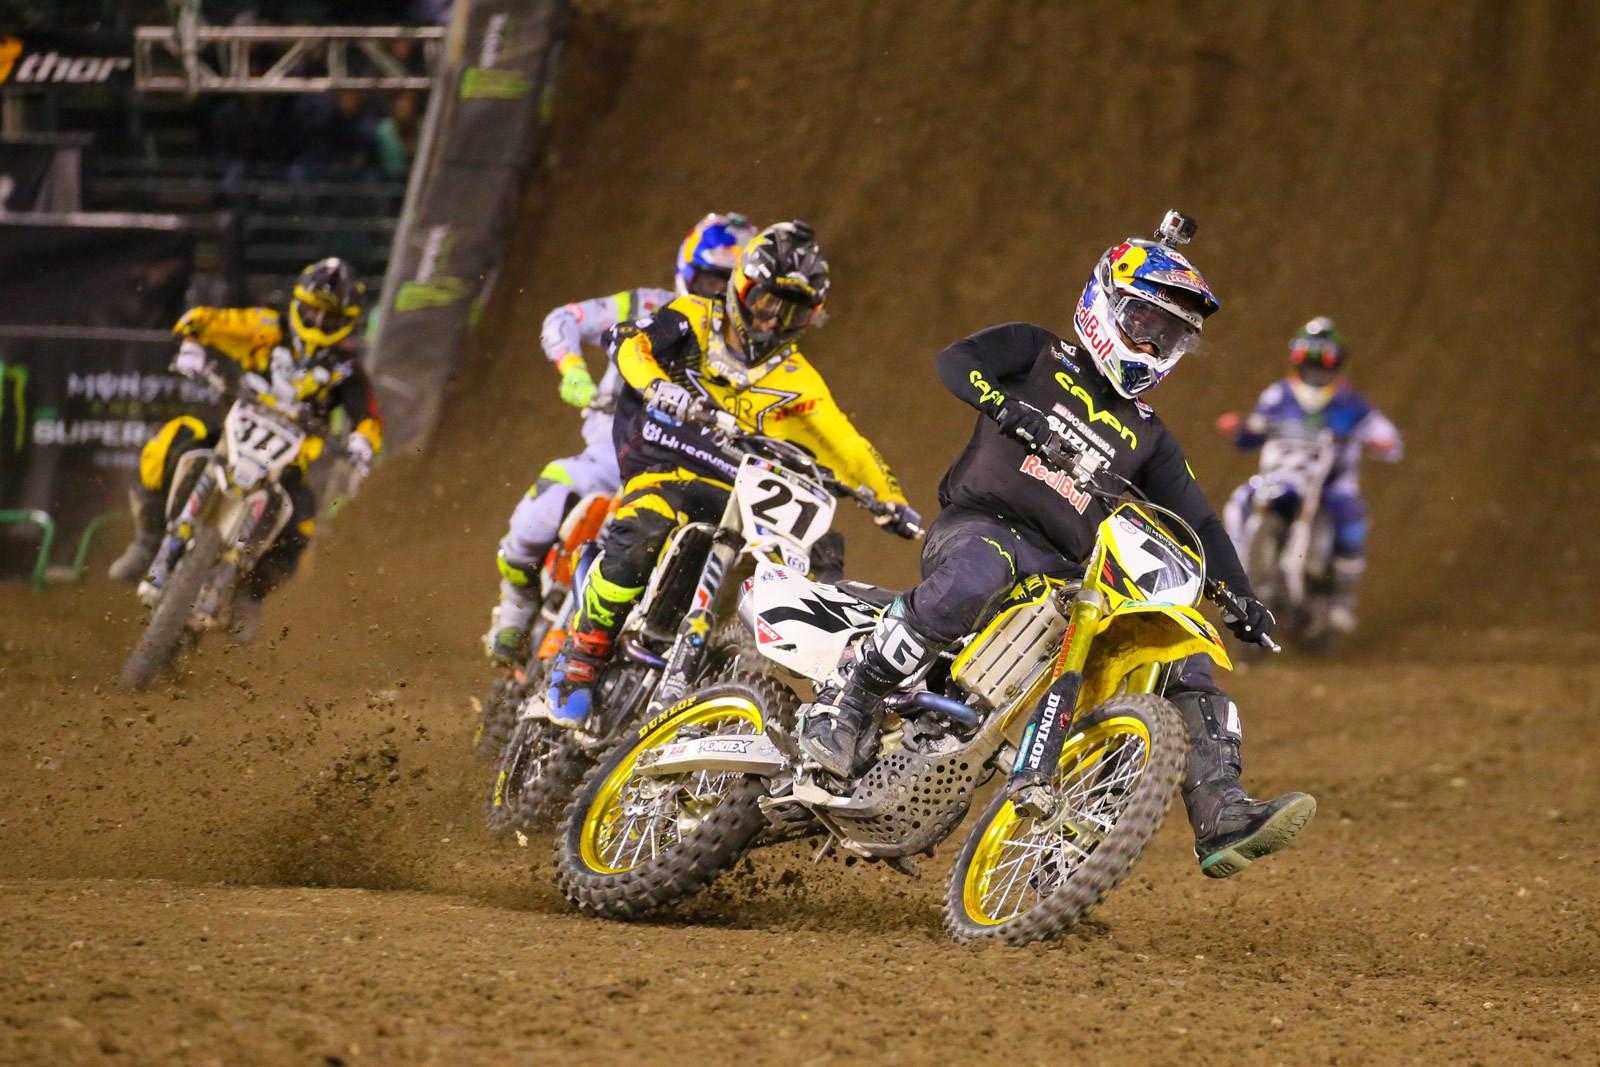 James Stewart - Photo Blast: Anaheim 1 - Motocross Pictures - Vital MX